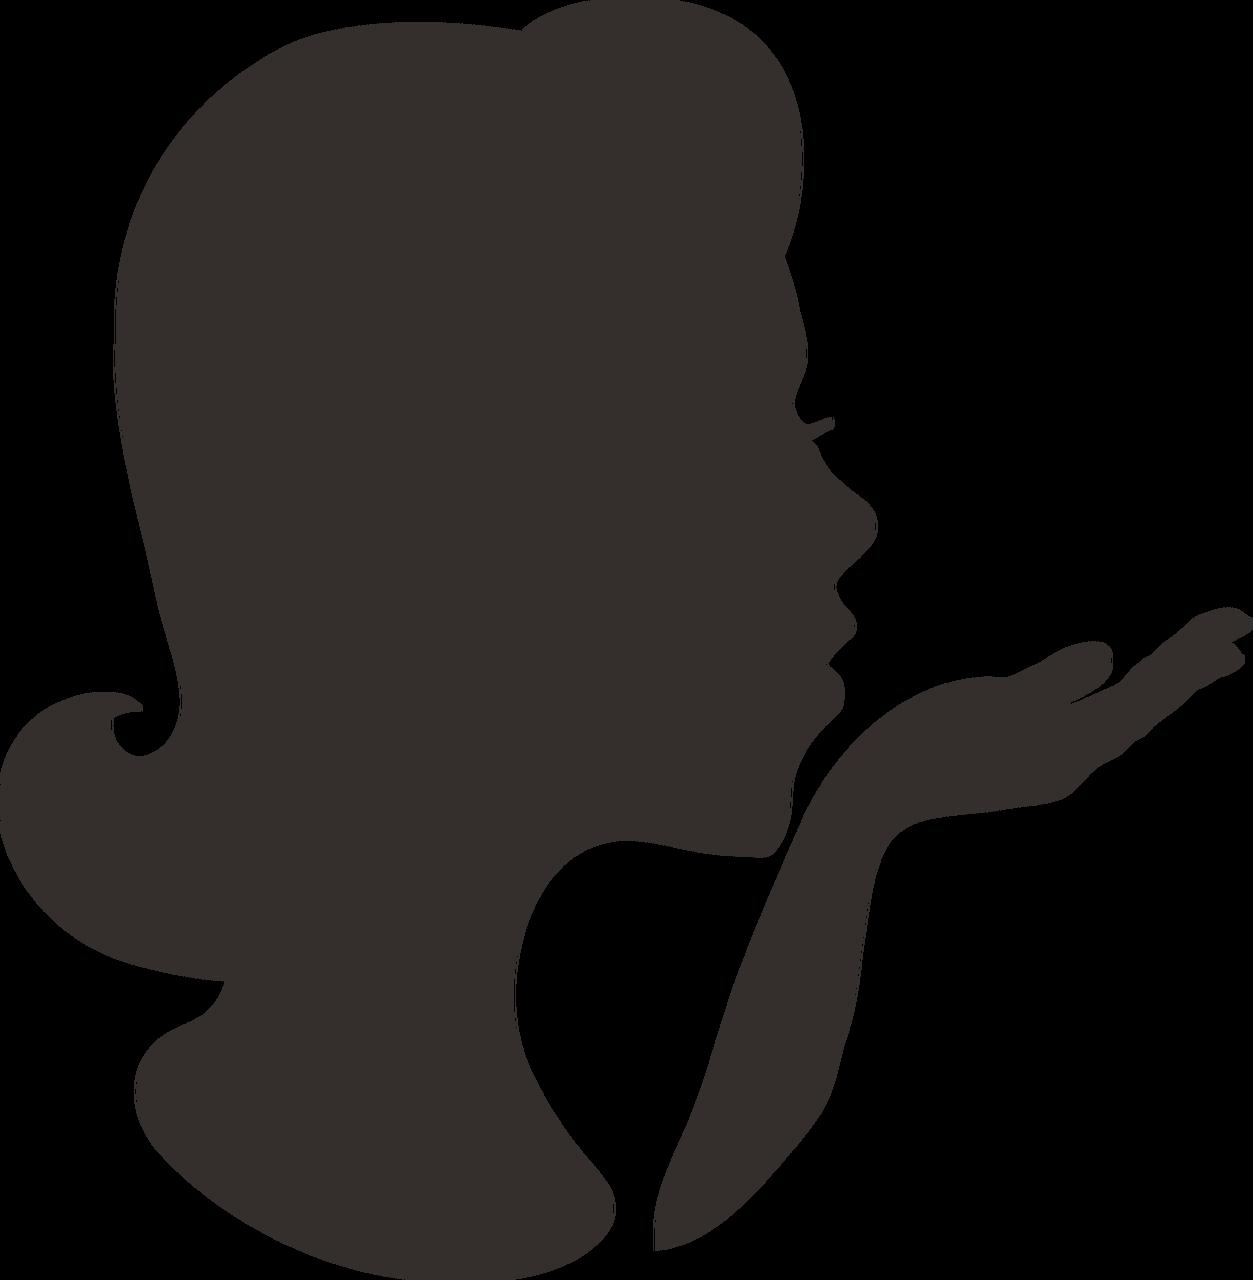 Woman Silhouette SVG Cut File